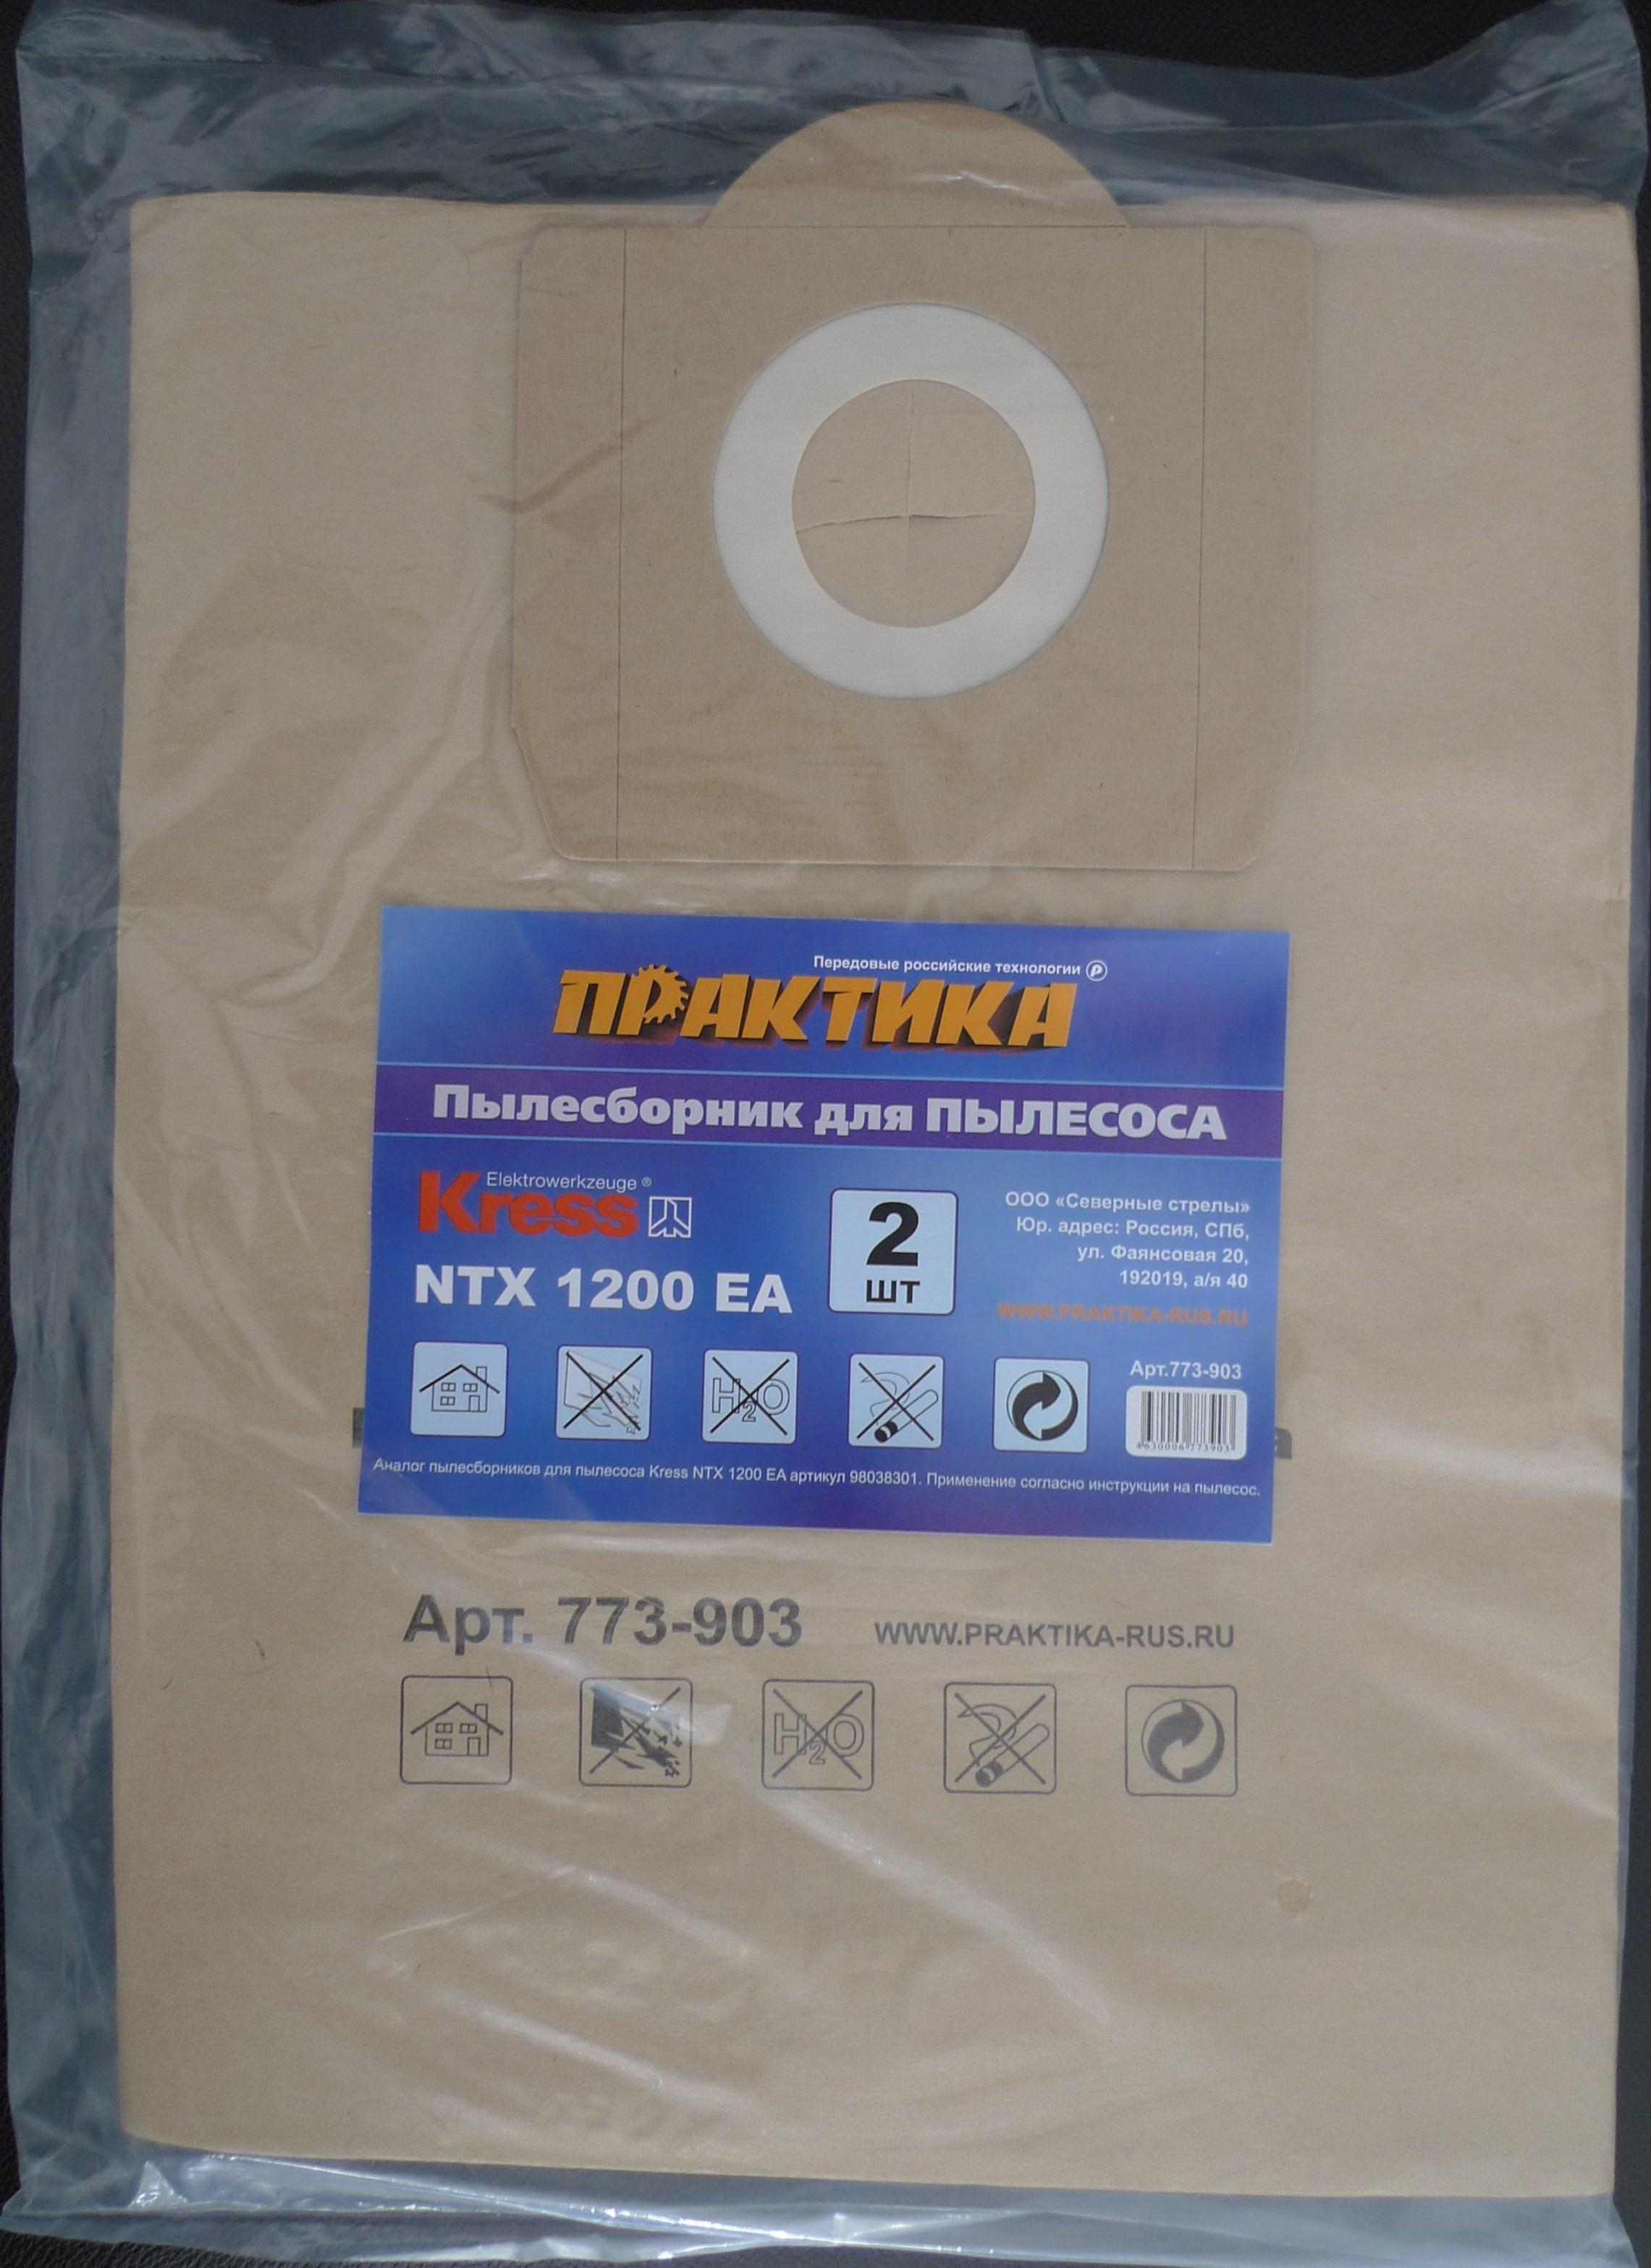 Мешок ПРАКТИКА 773-903 для kress 1200, 2шт. сменная туба sr 400 для аккумуляторных пневмопистолетов для пакетов 400мл kress